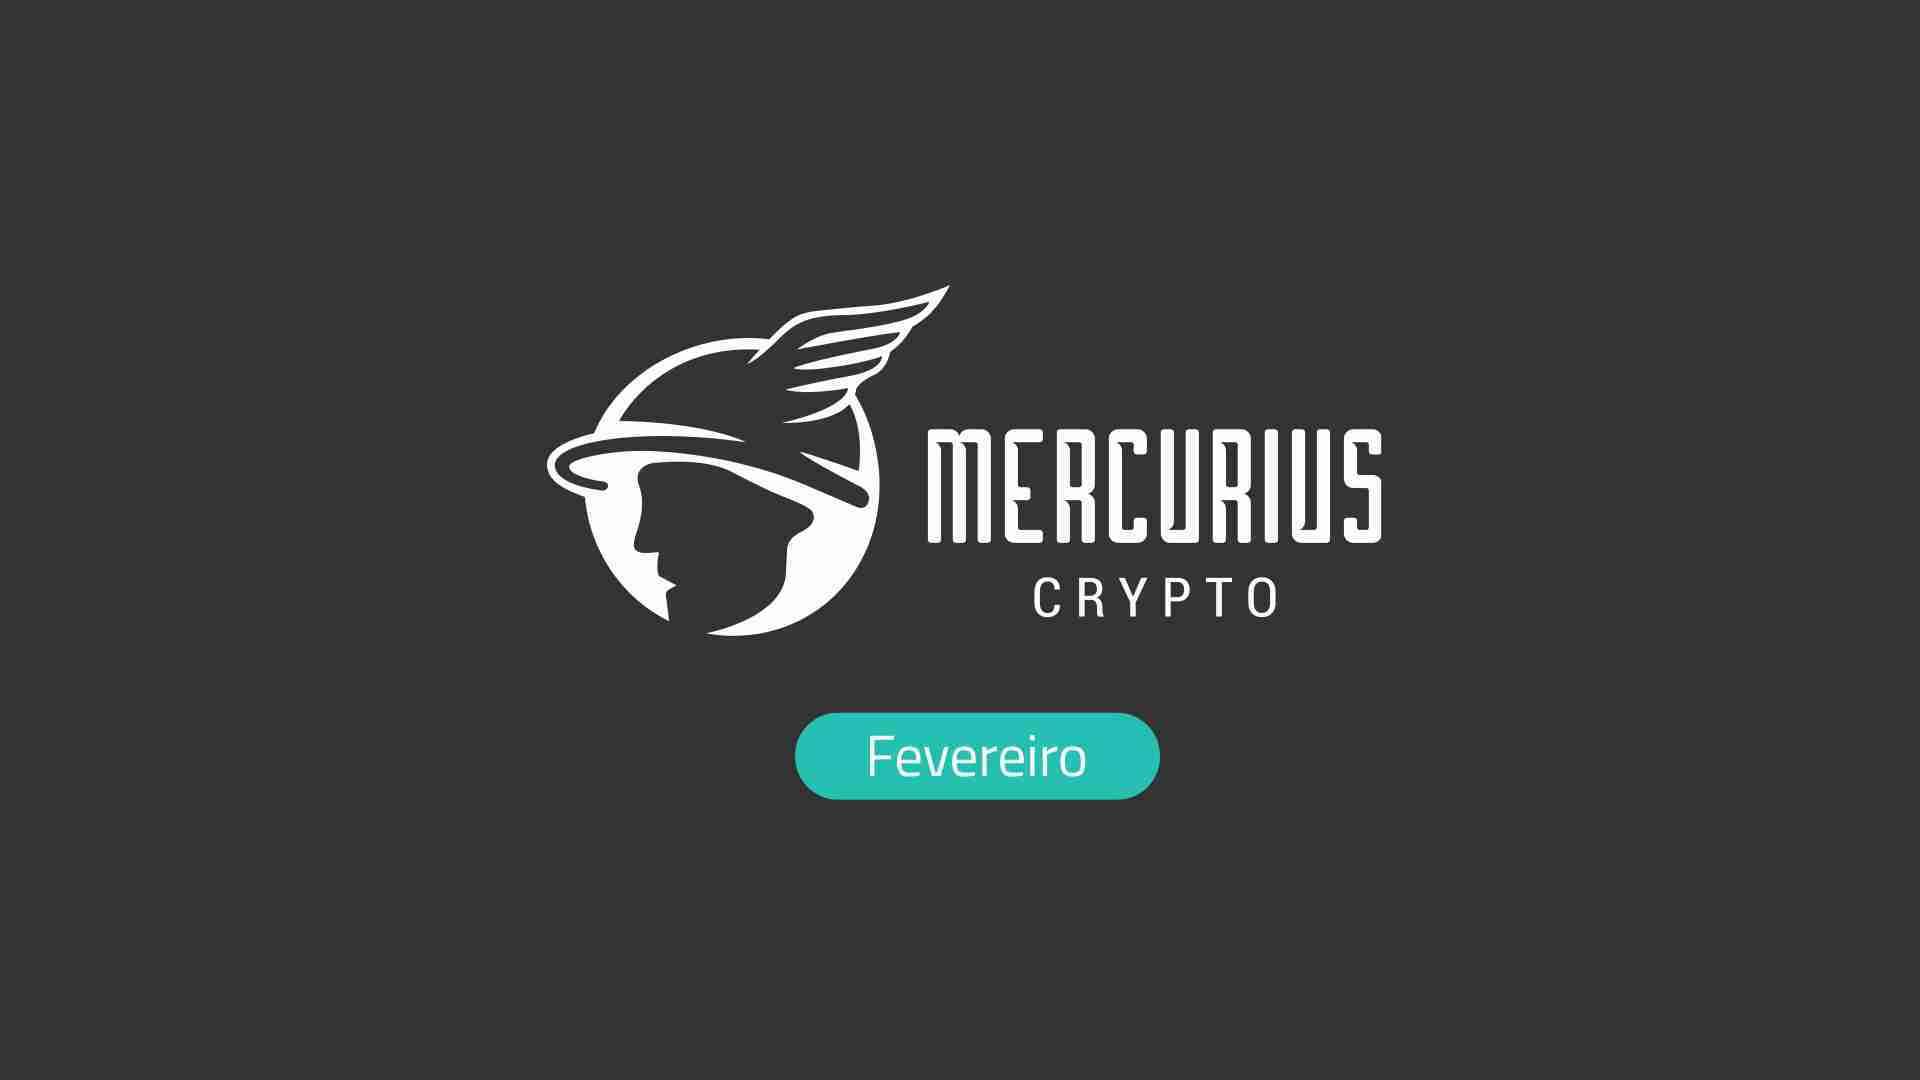 O futuro do mercado cripto: DeFi e NFT. Report da Mercurius Feveiro